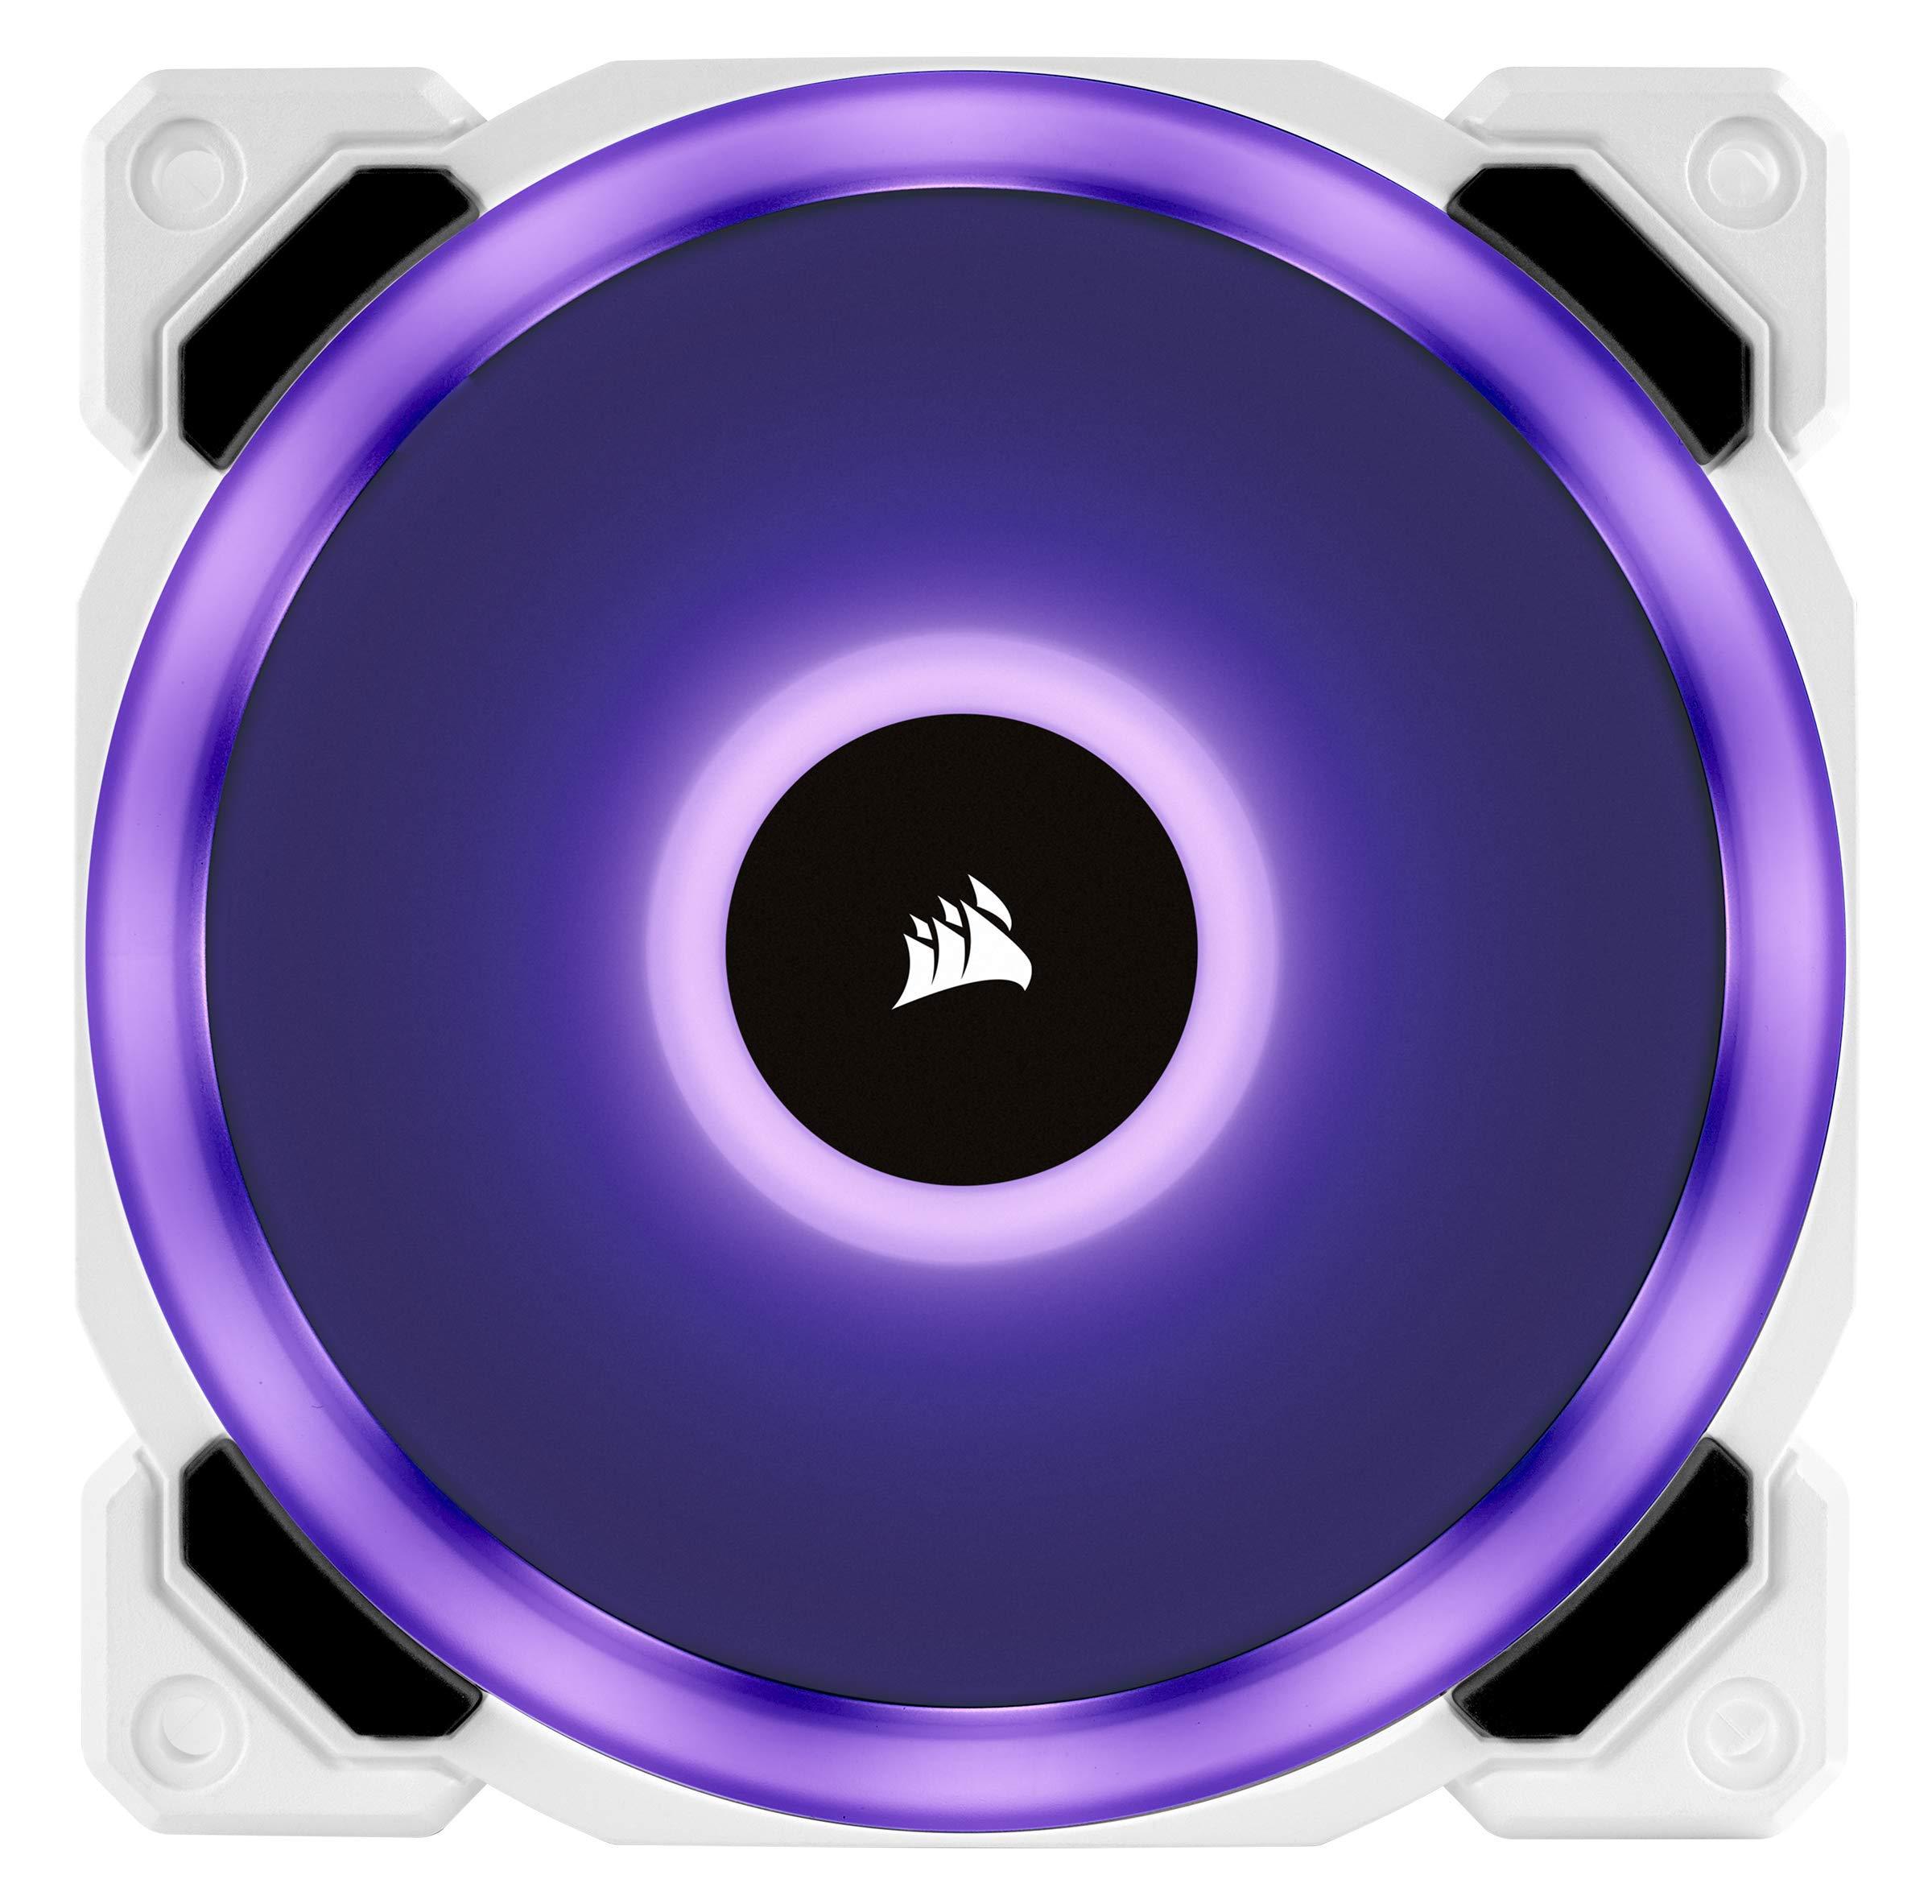 CORSAIR LL Series, LL120 RGB, 120mm RGB LED Fan, Triple Pack with Lighting Node PRO- White by Corsair (Image #13)